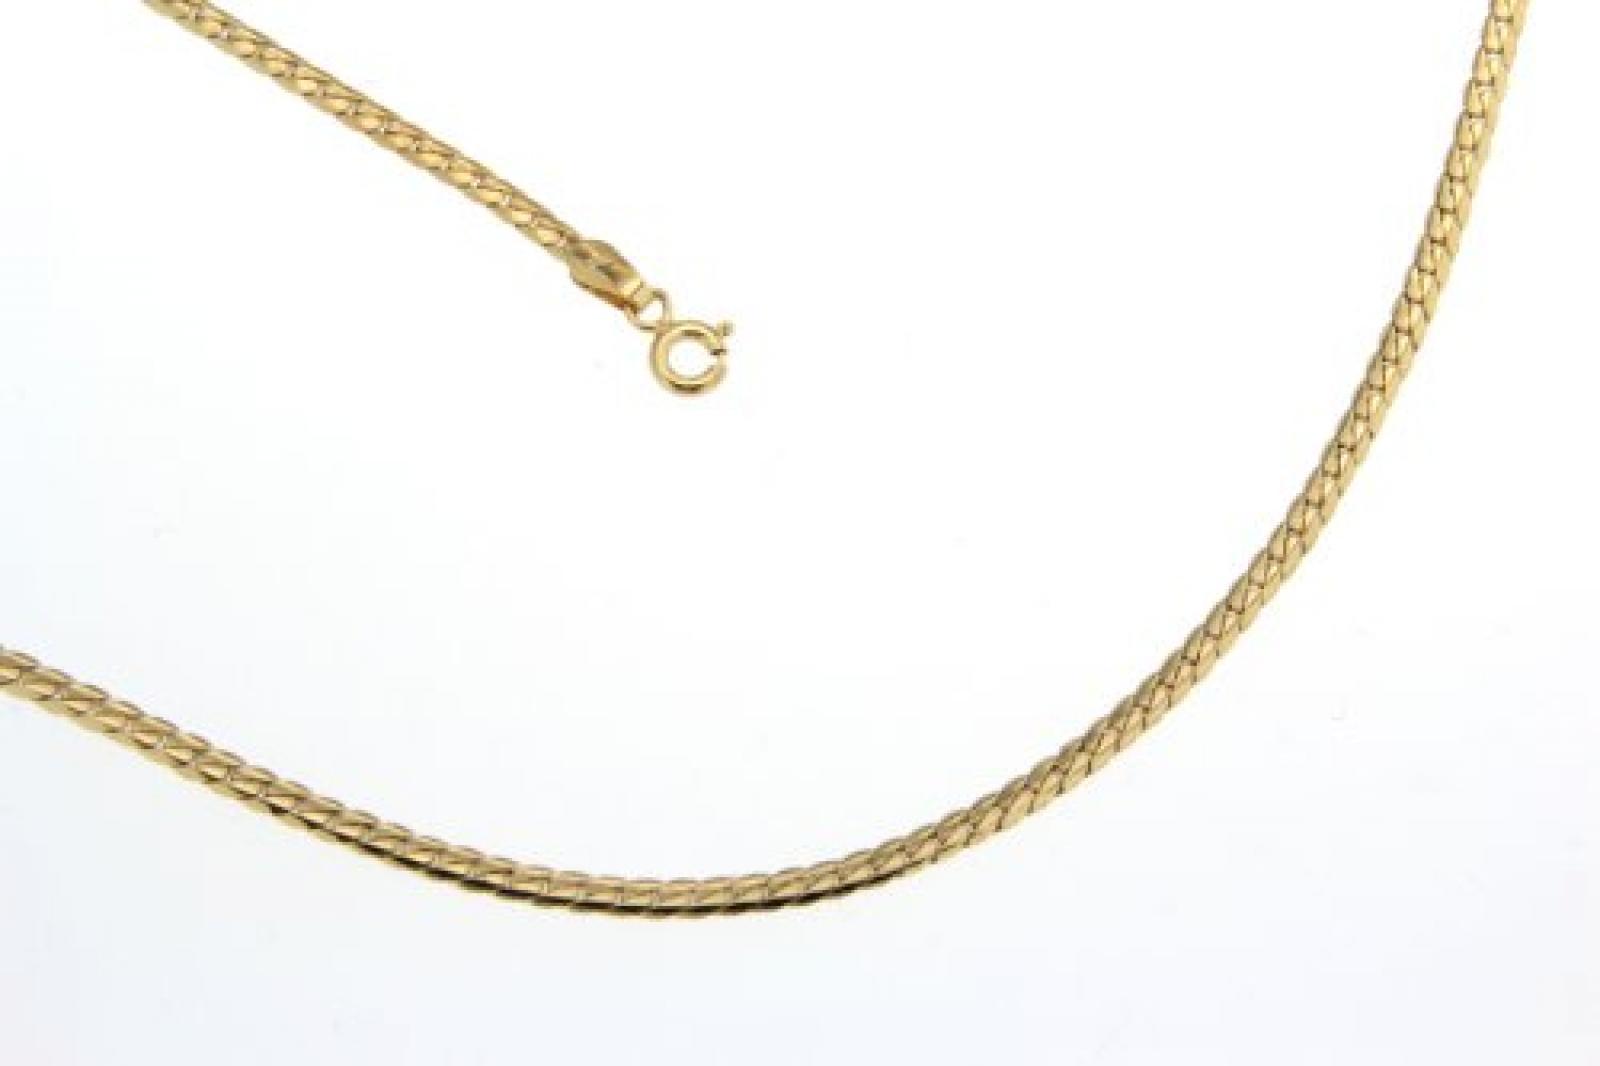 BOB C. Damen-Halskette 9 Karat 375 Gelbgold Panzer eng 272218